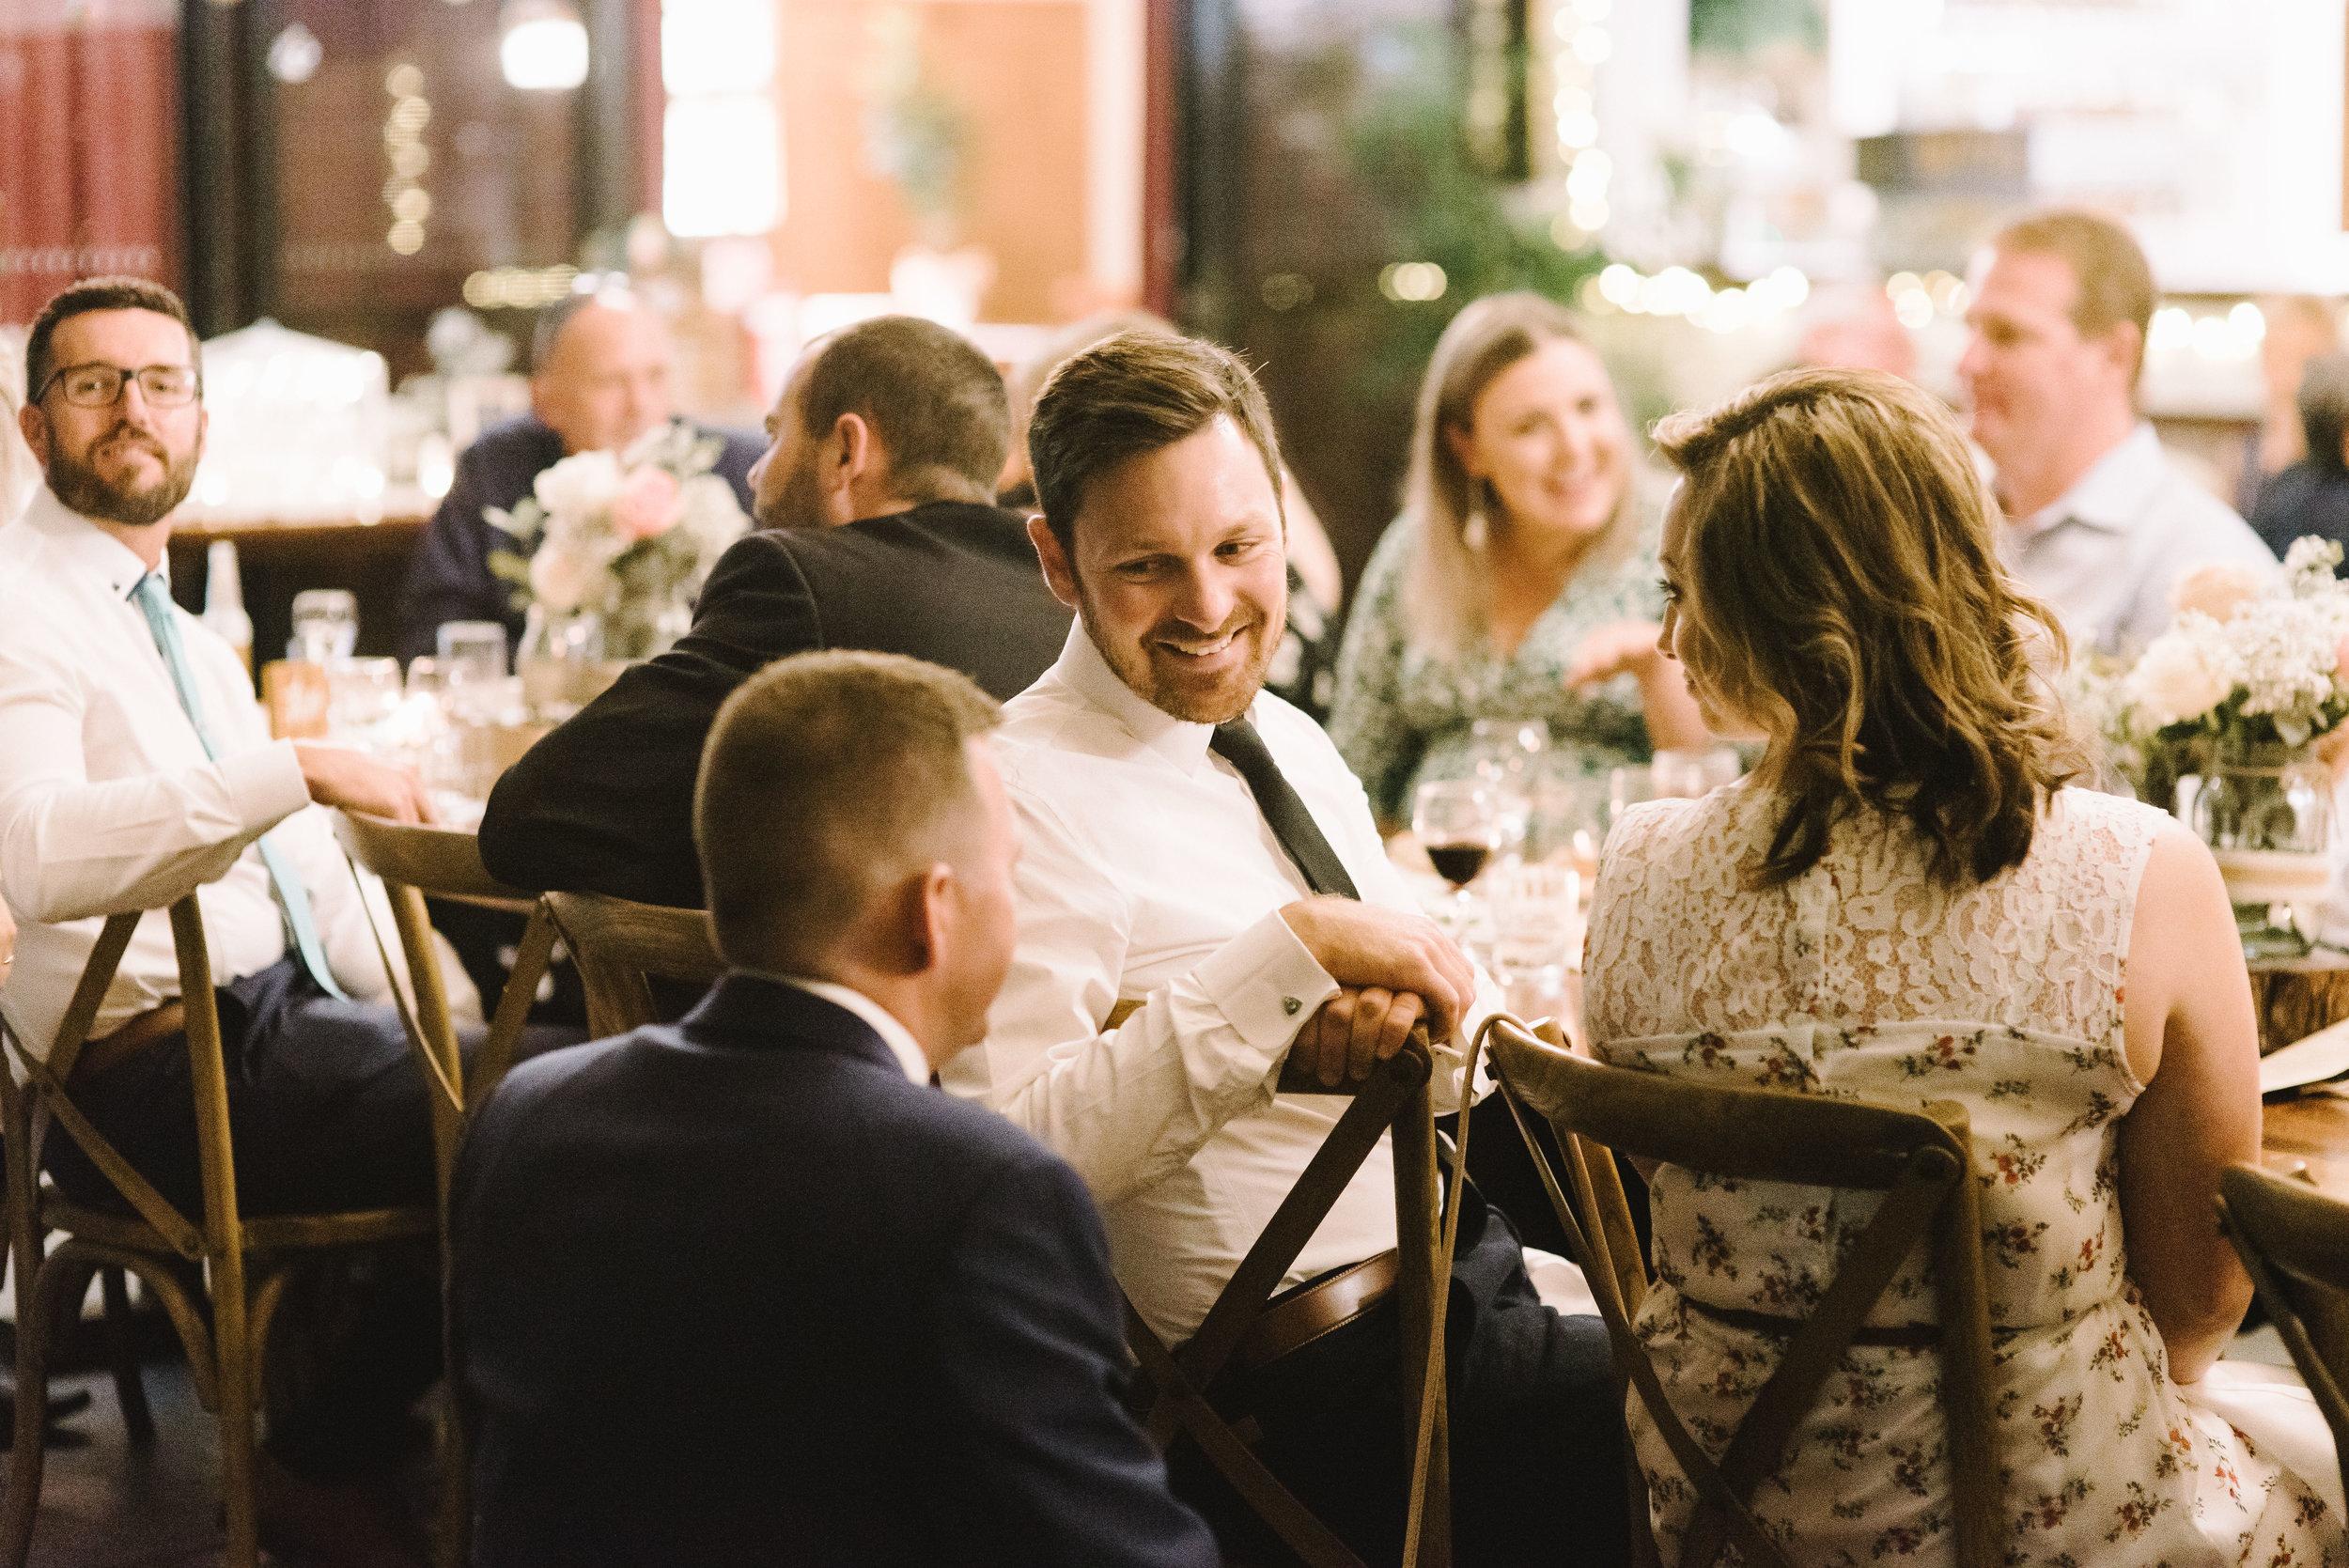 LAURENOLIVIA-austinvilla-estate-wedding-84.jpg